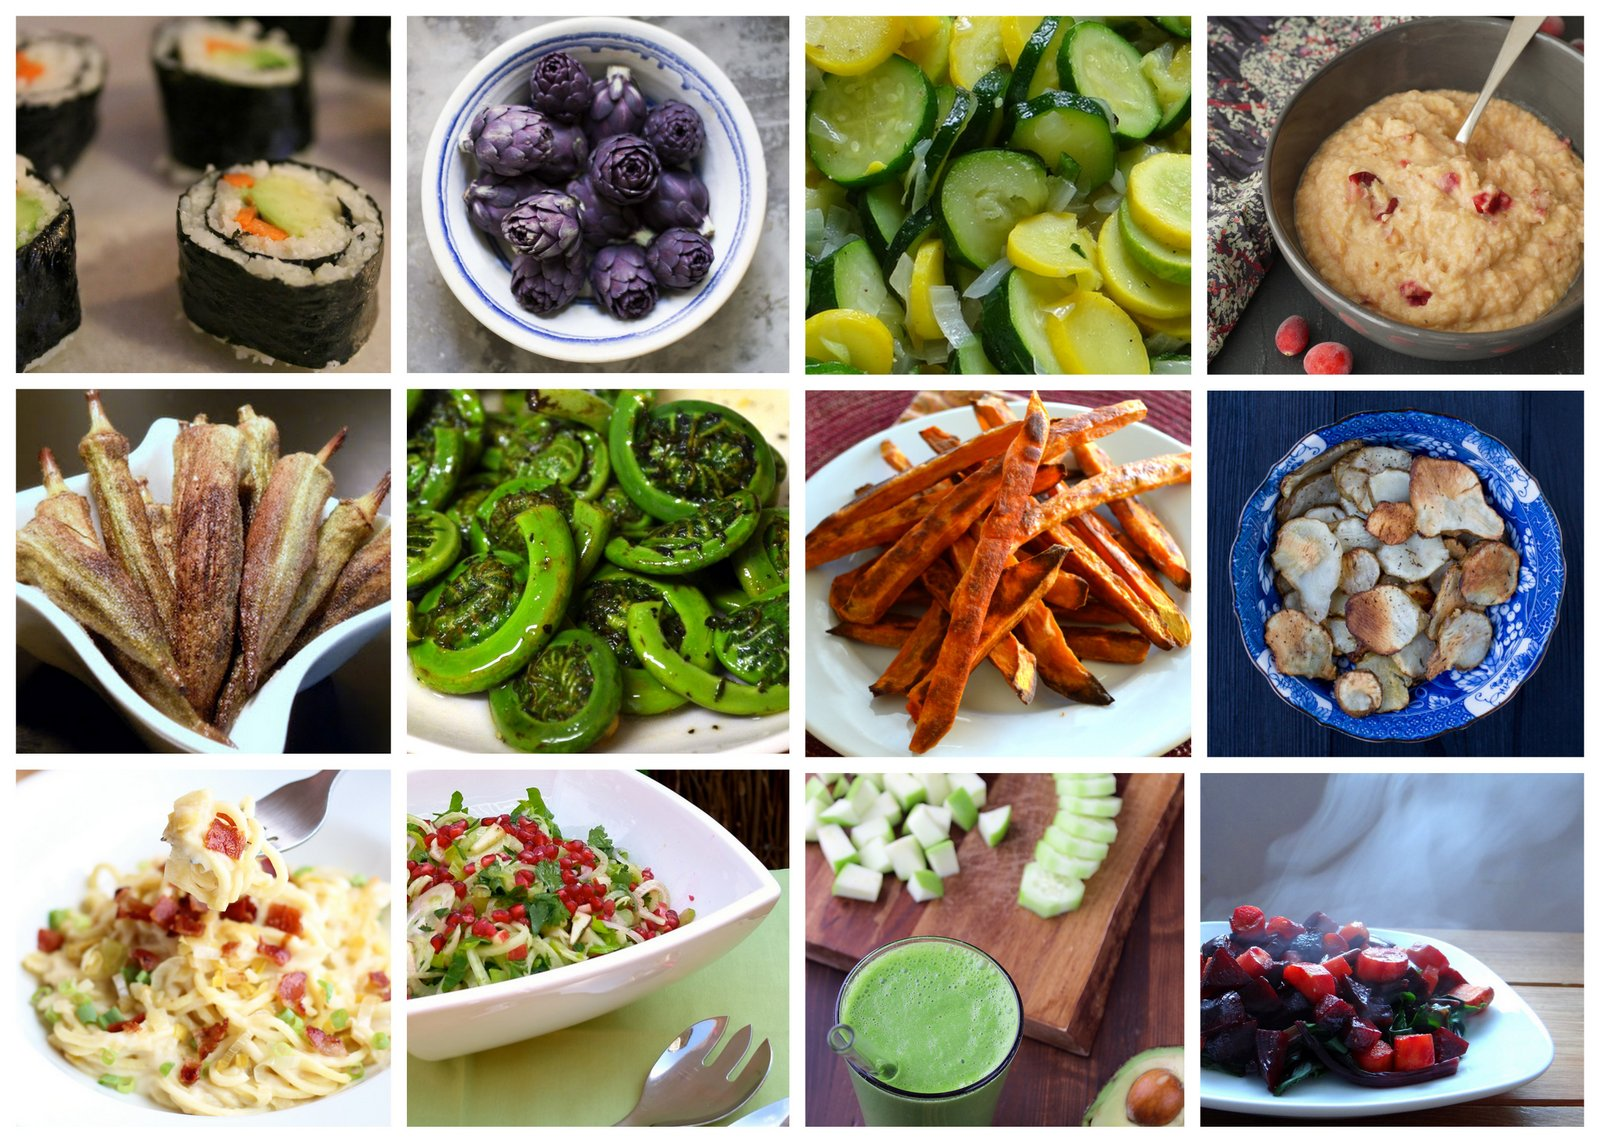 A-Z Vegetable Recipe Roundup (Wahls + Paleo AIP) | Phoenix Helix